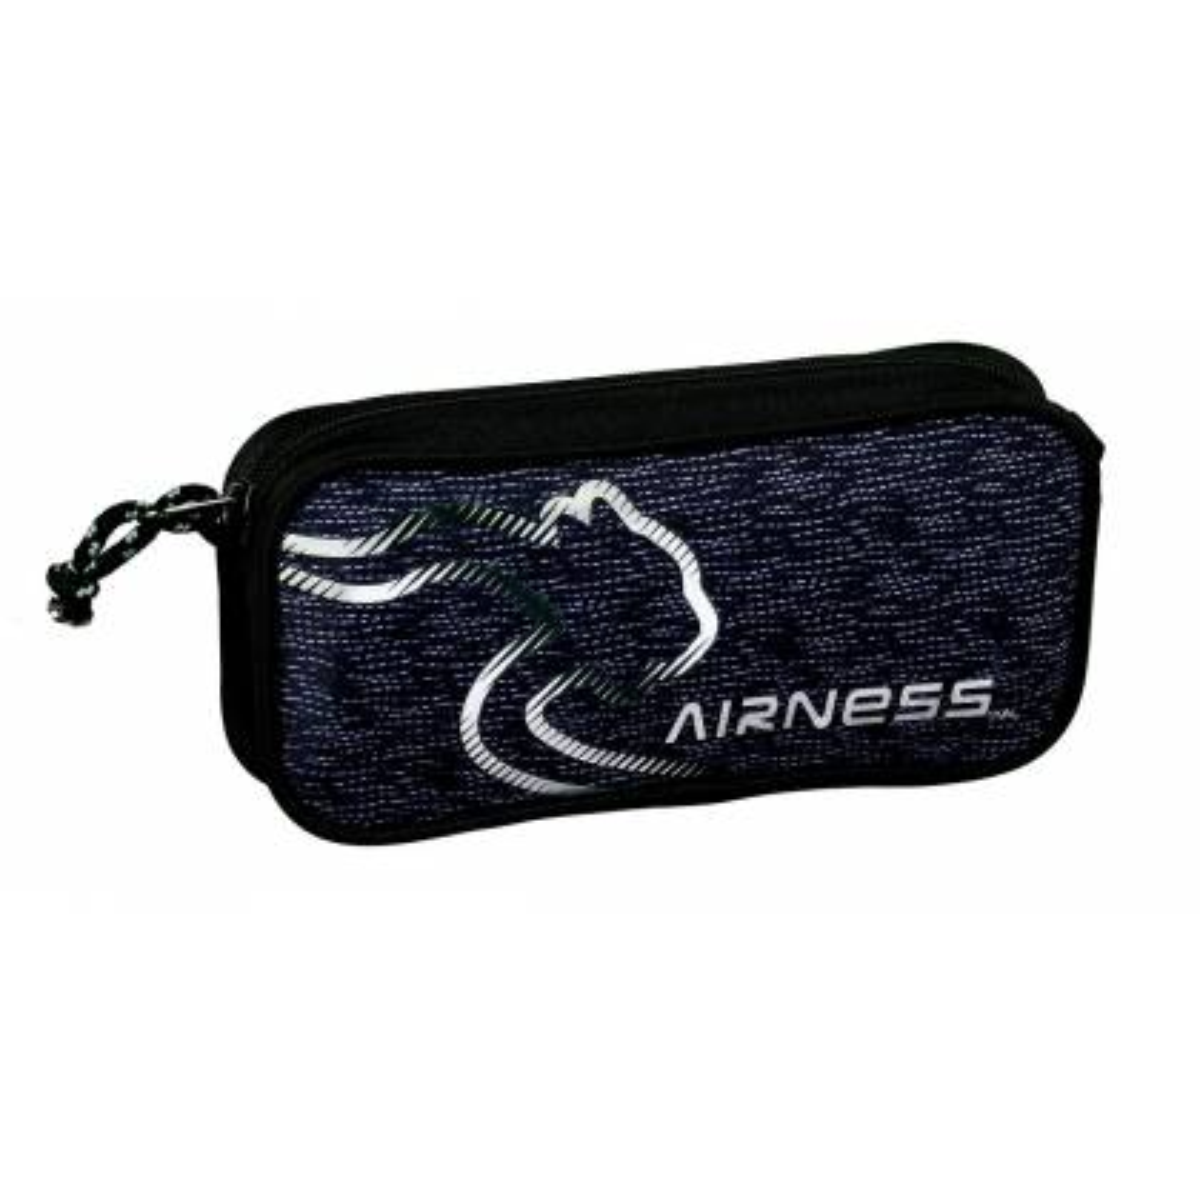 Airness - Trousse Rectangulaire Dryce - Gris Chiné